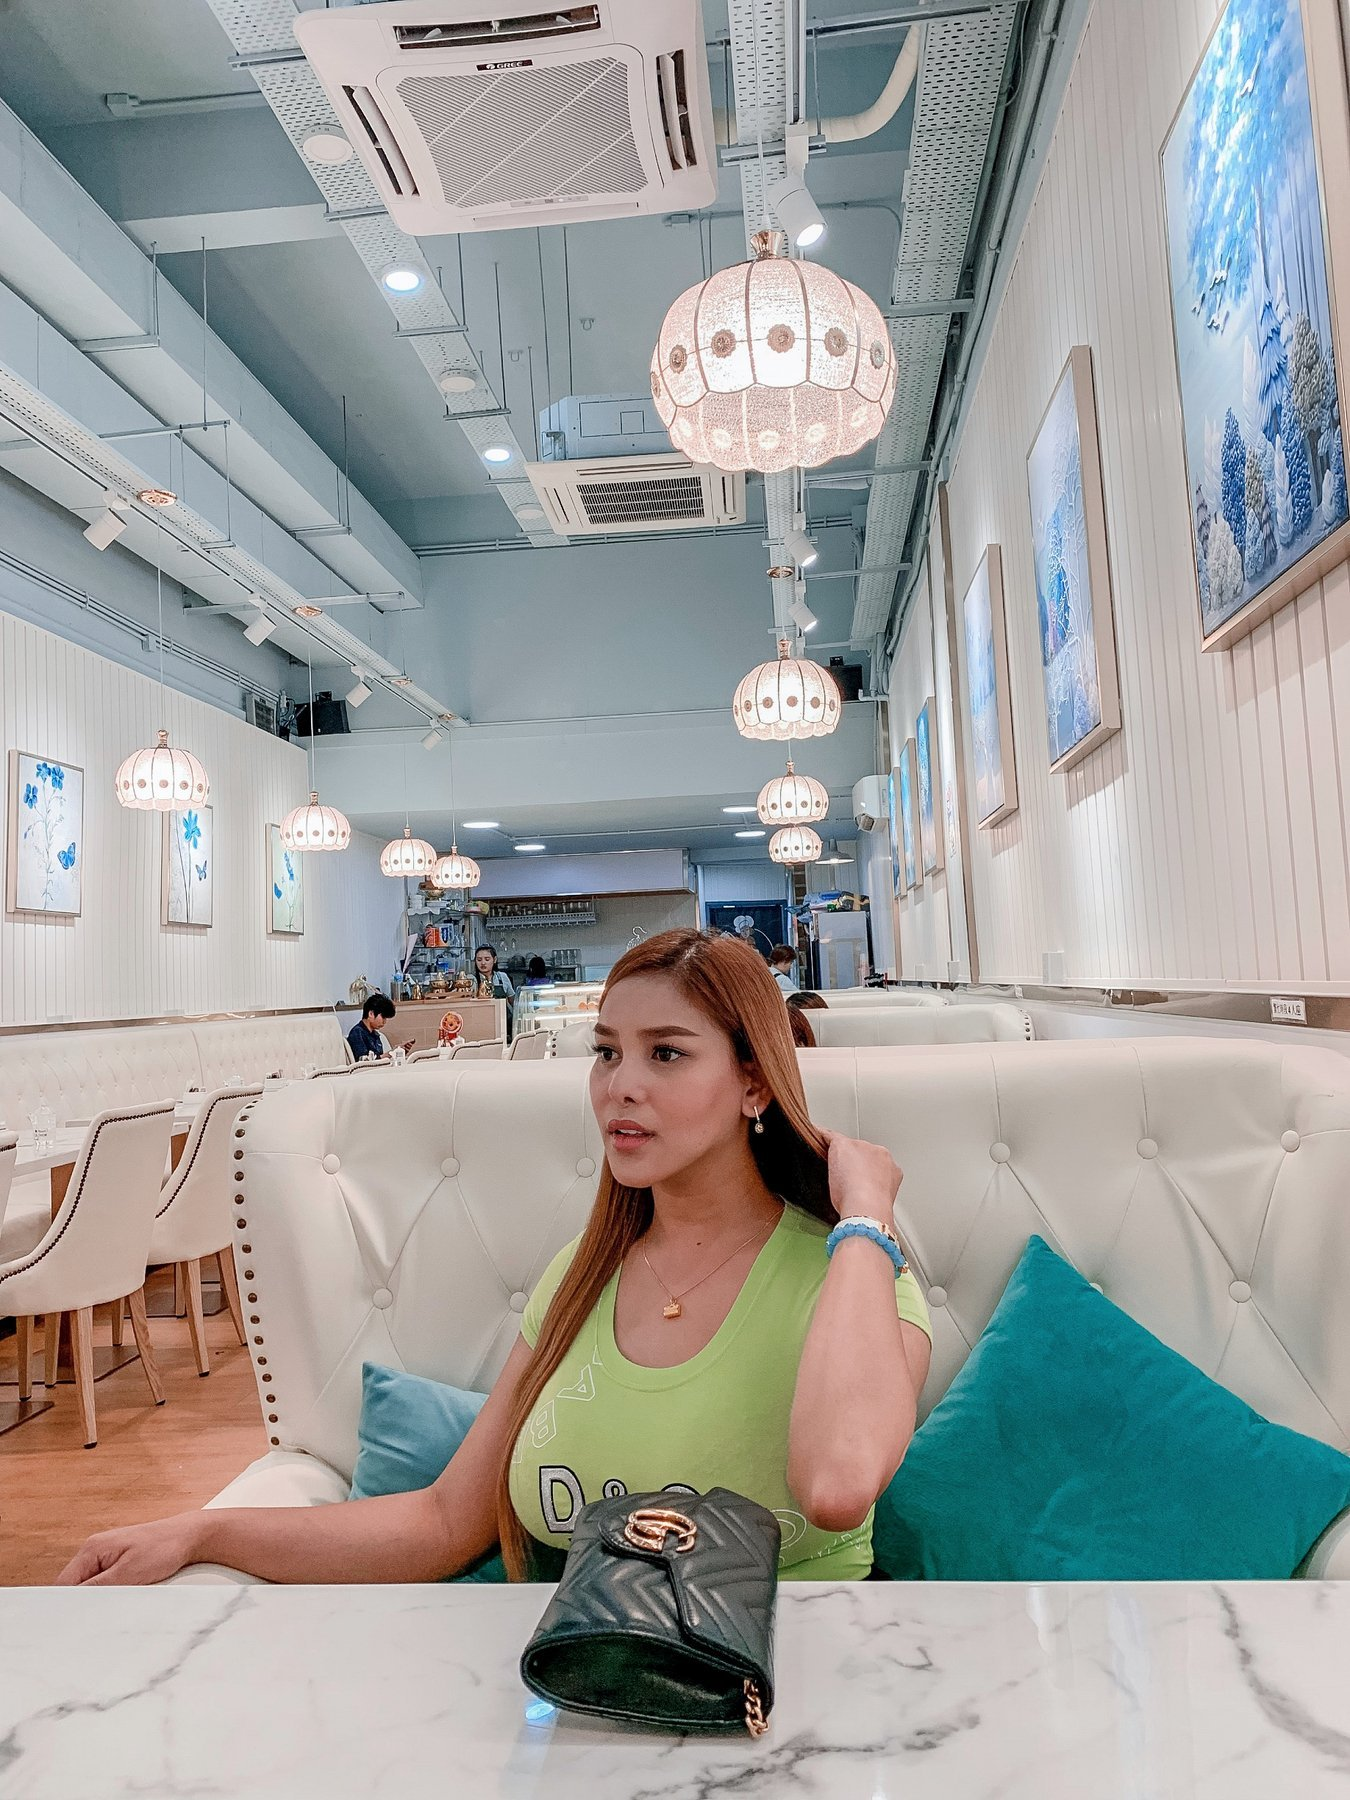 FILIPINA SWEETHEART (WEBCAM SEX), Filipino escort in Manila